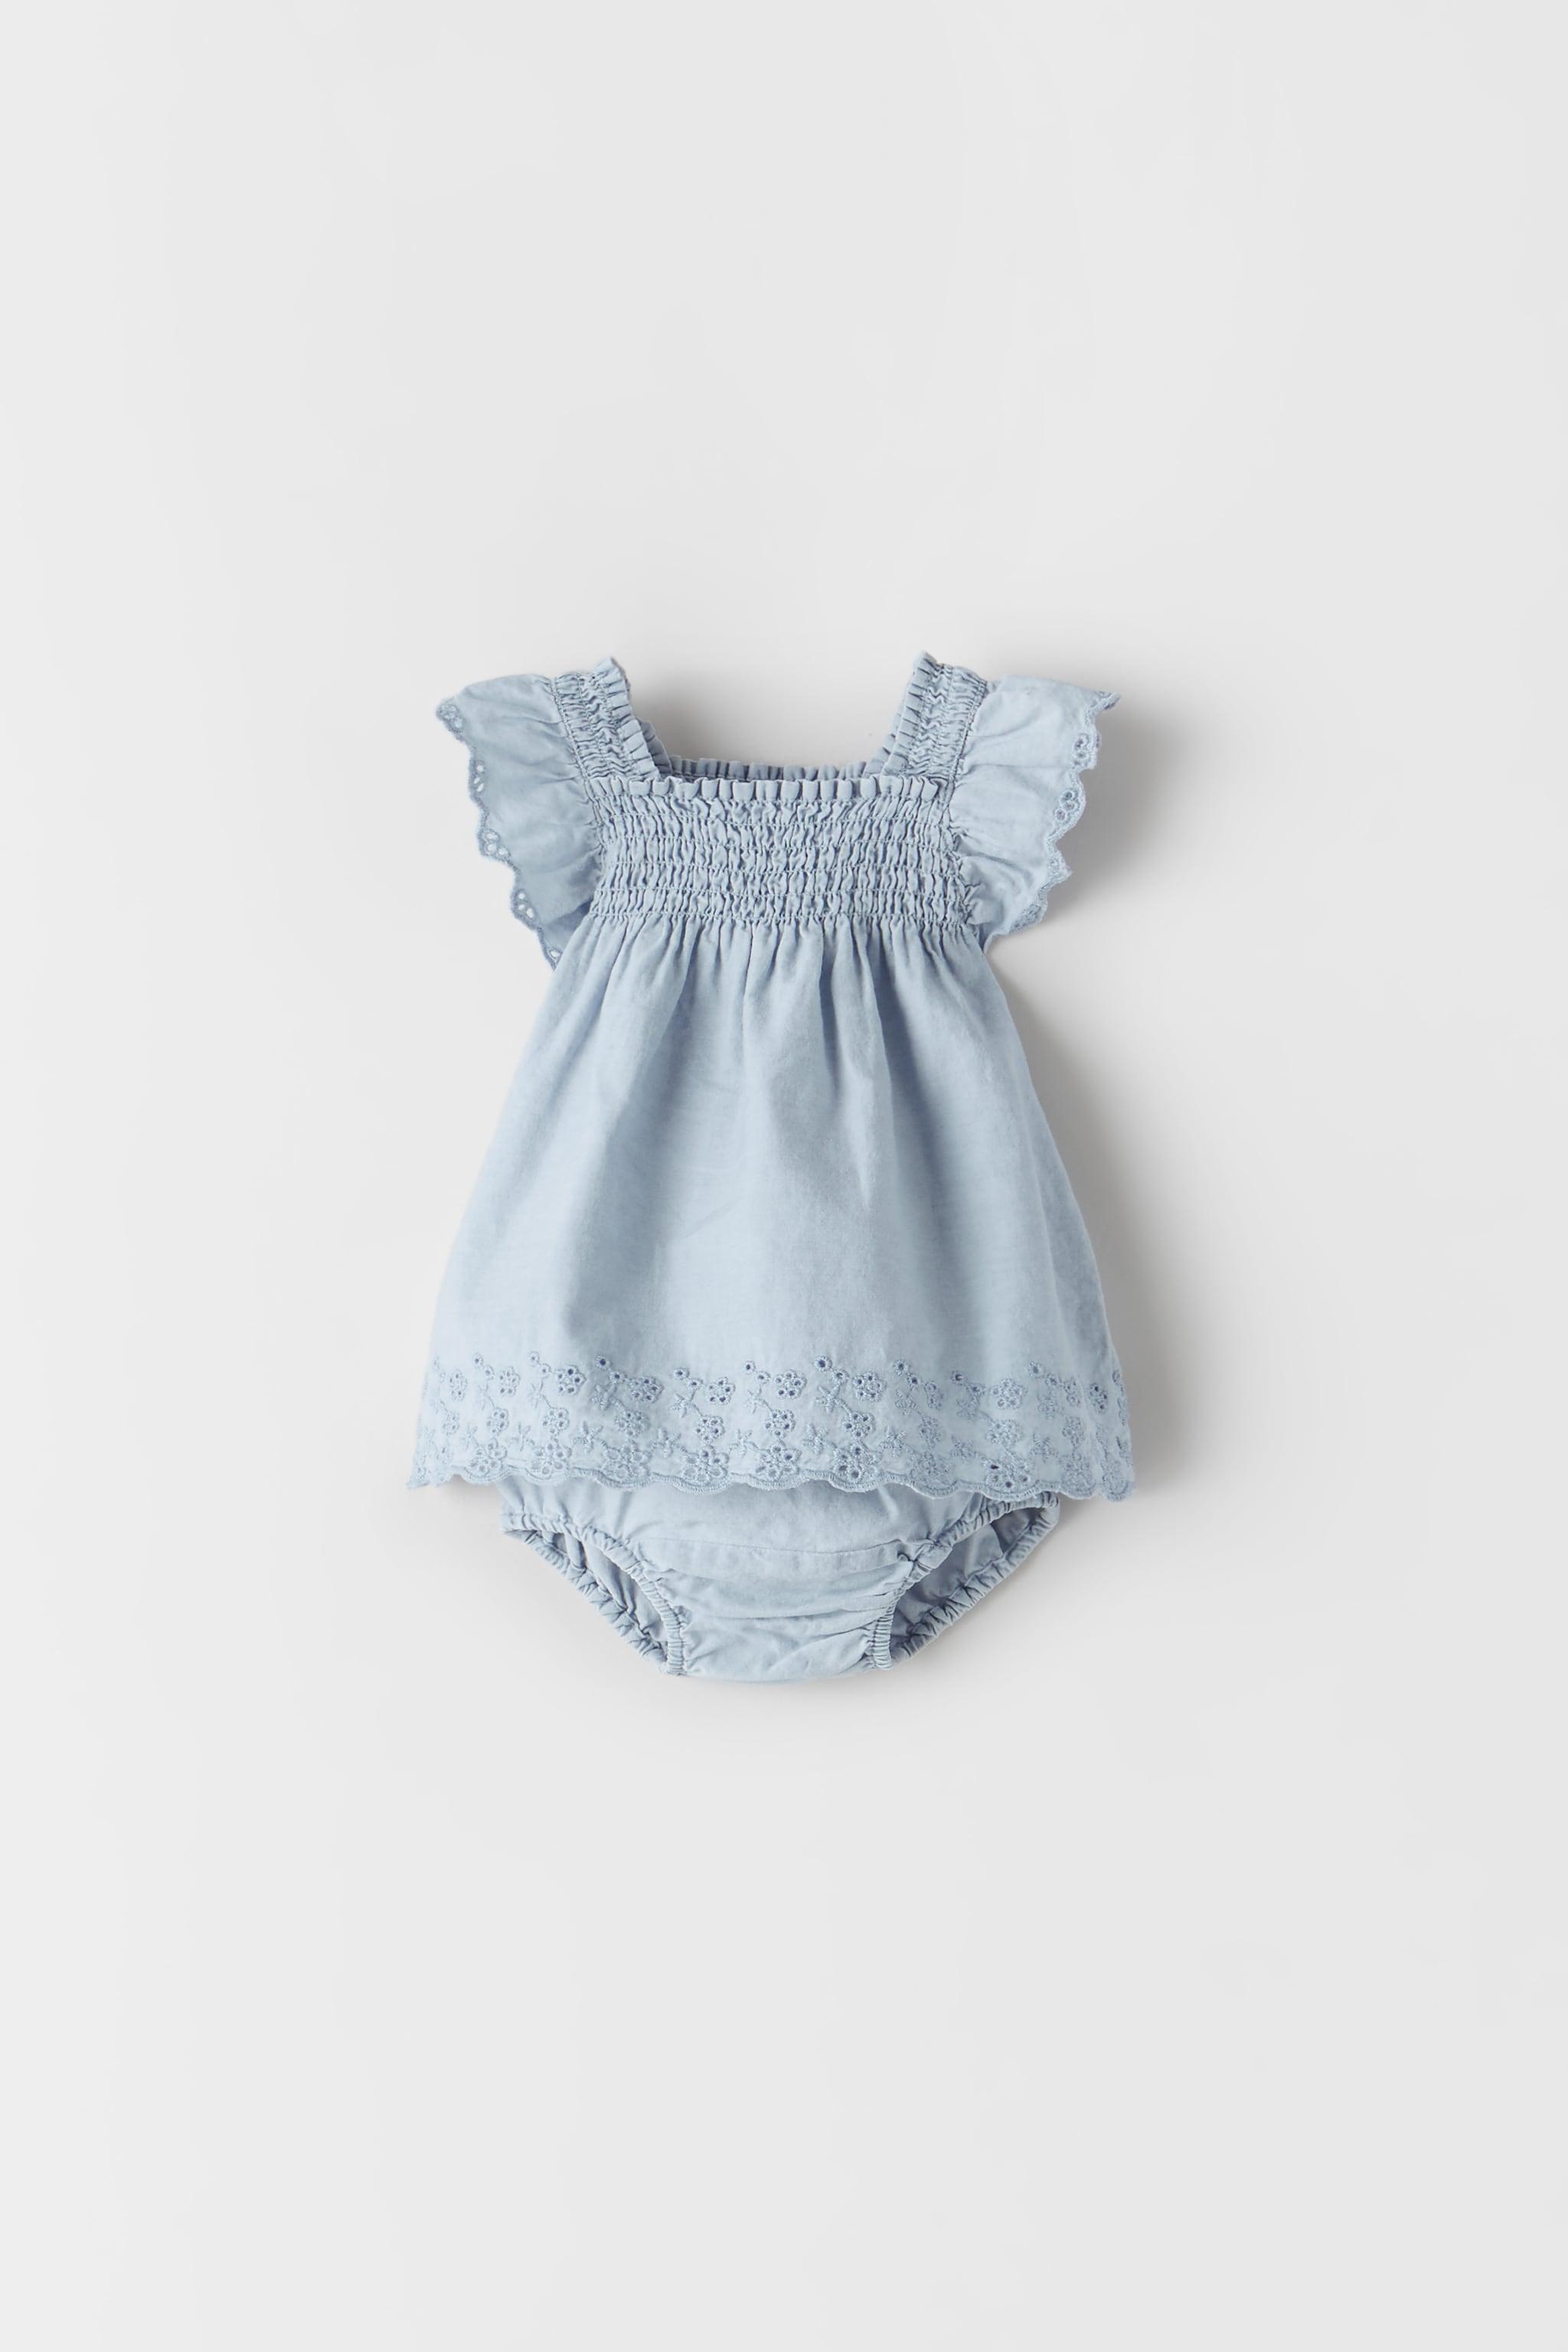 Zara EMBROIDERED DENIM DRESS